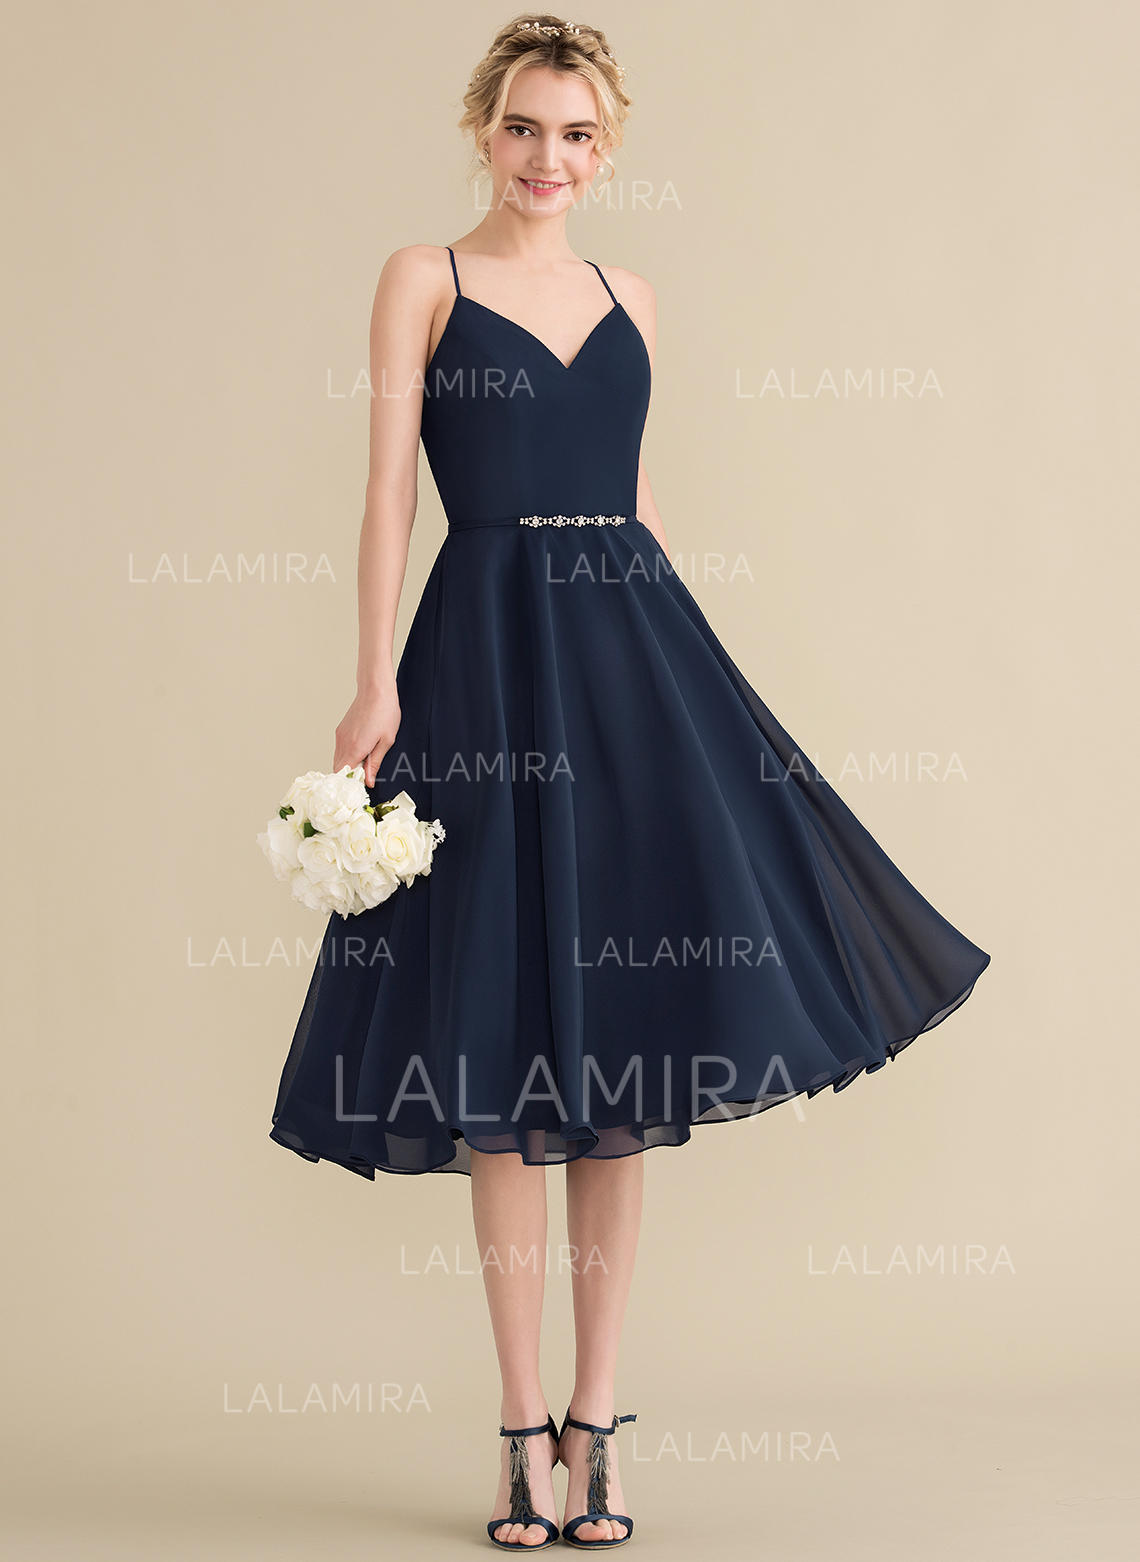 0ec58980219 A-Line Princess V-neck Knee-Length Chiffon Cocktail Dress With Beading. Loading  zoom